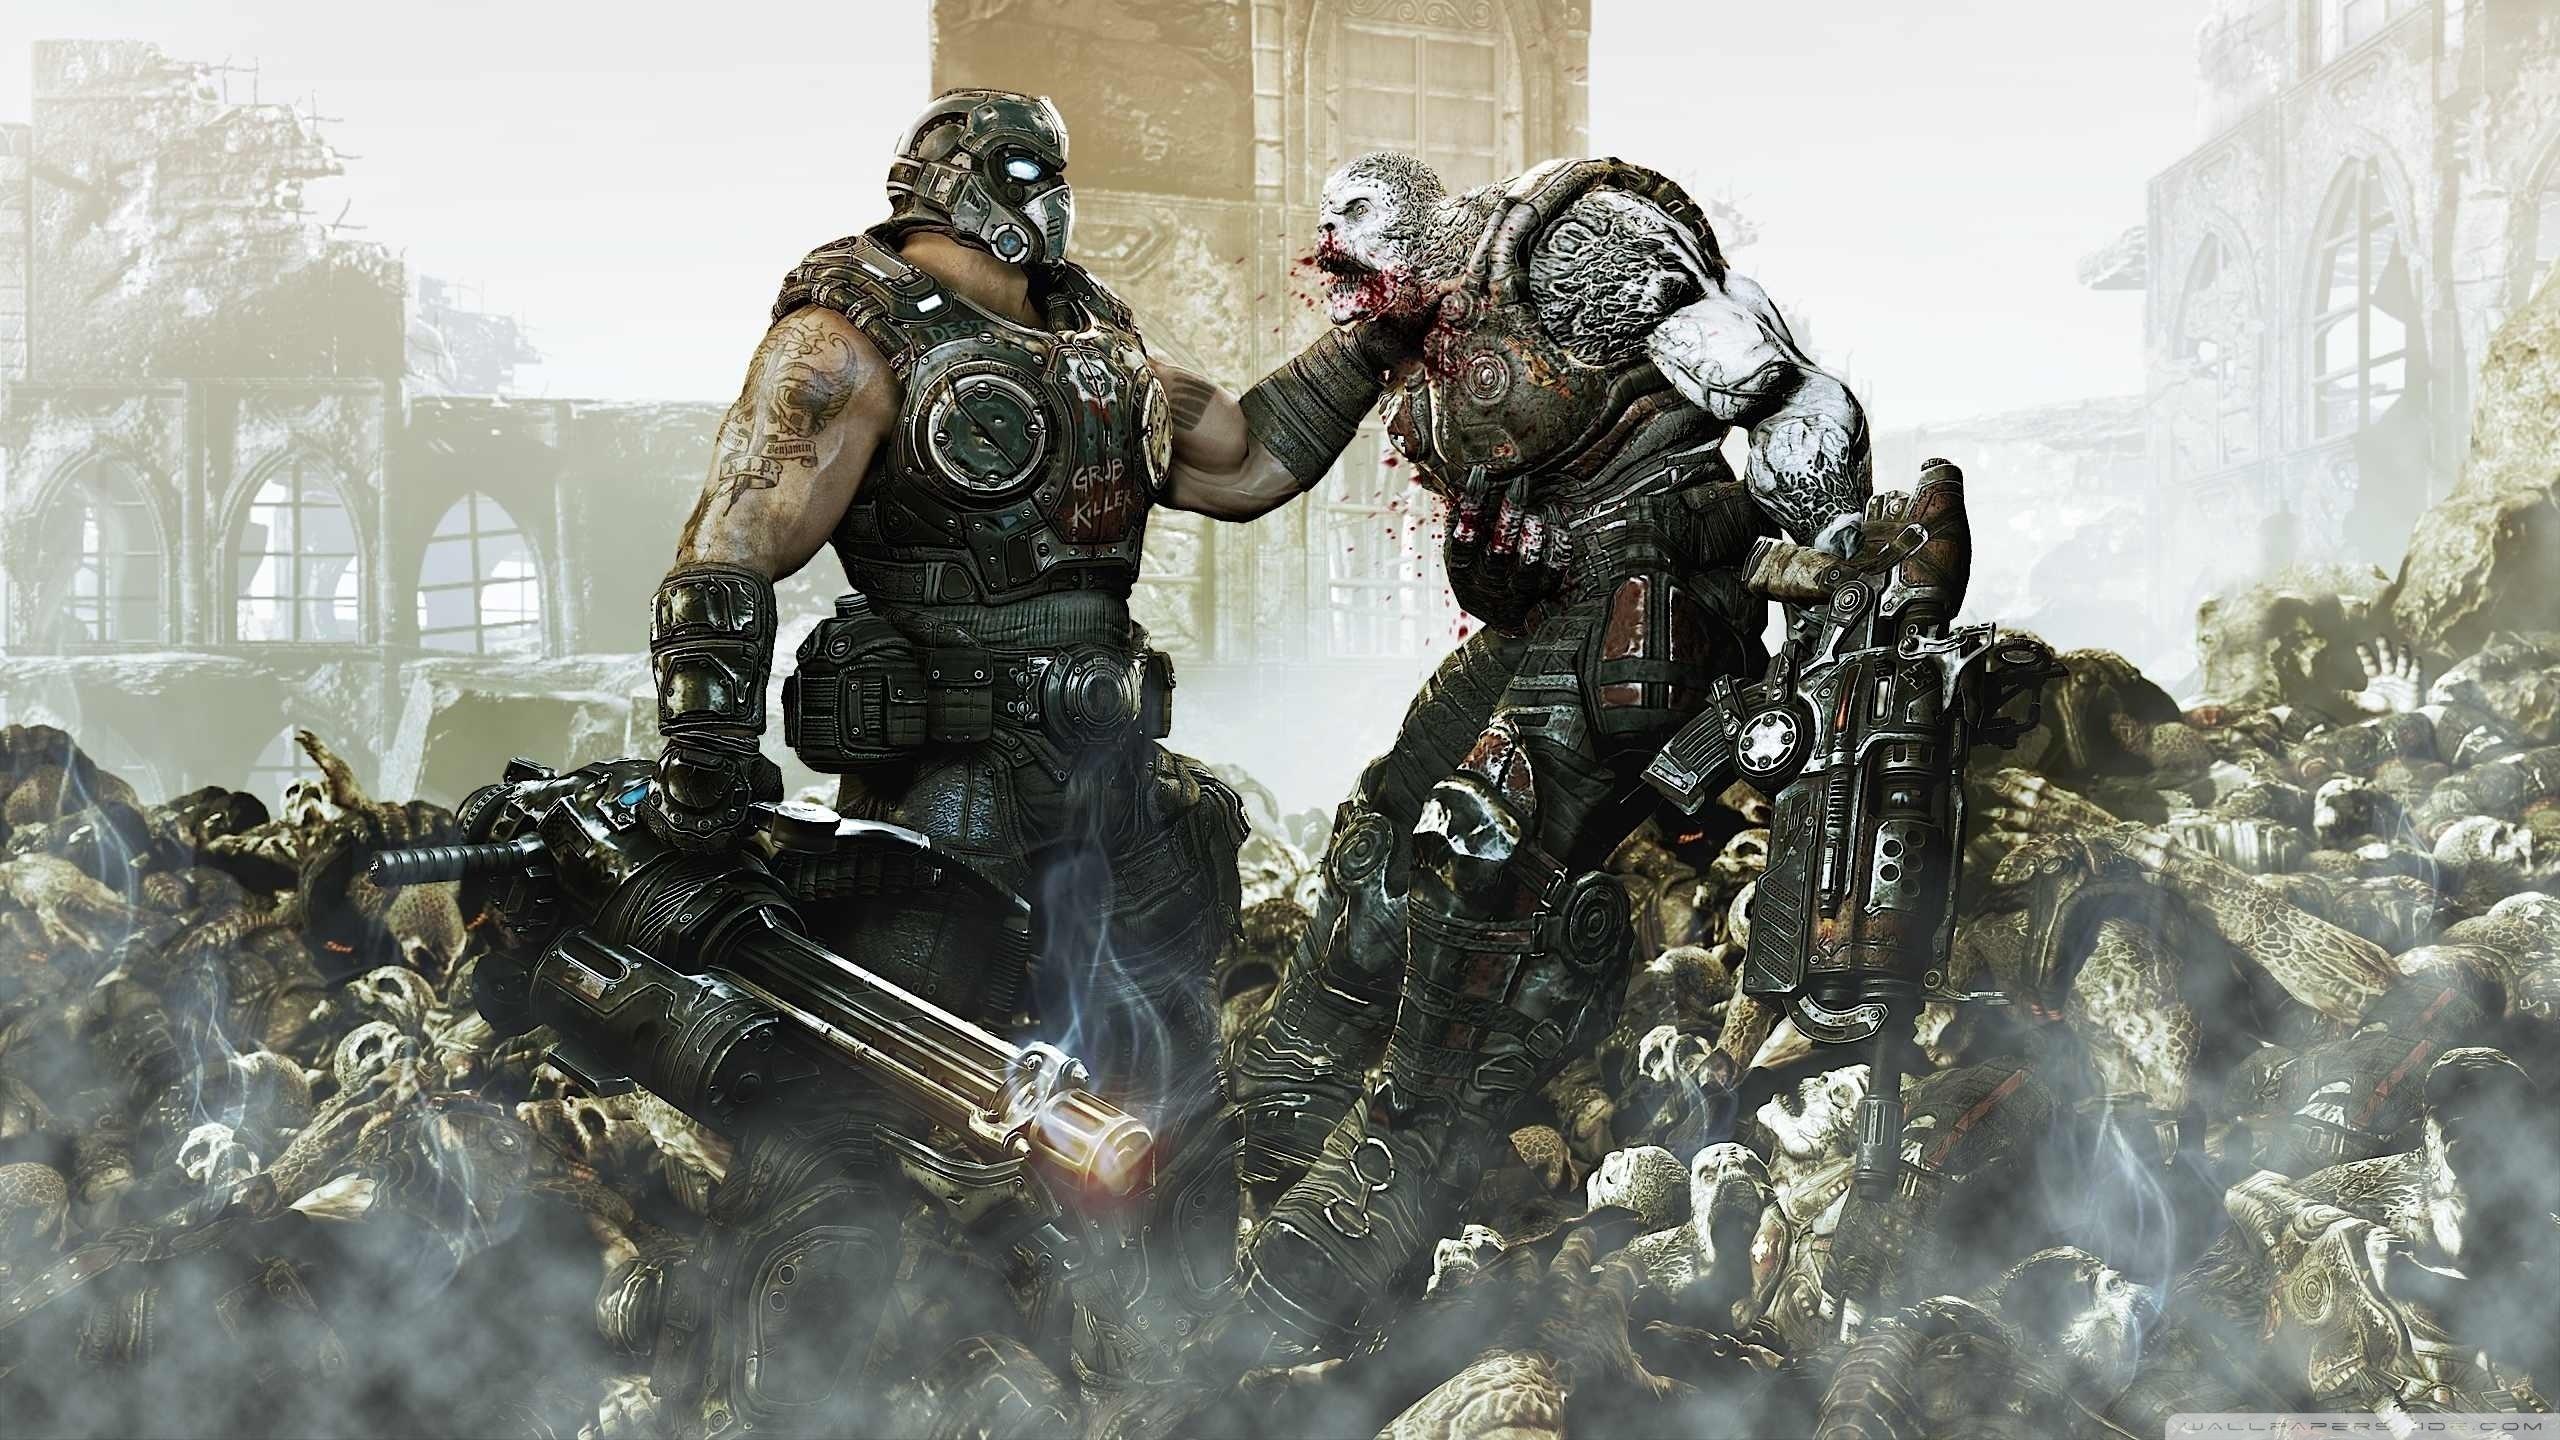 Fondos De Pantalla Gears Of War 3 Hd 2560x1440 Qhd Imagen